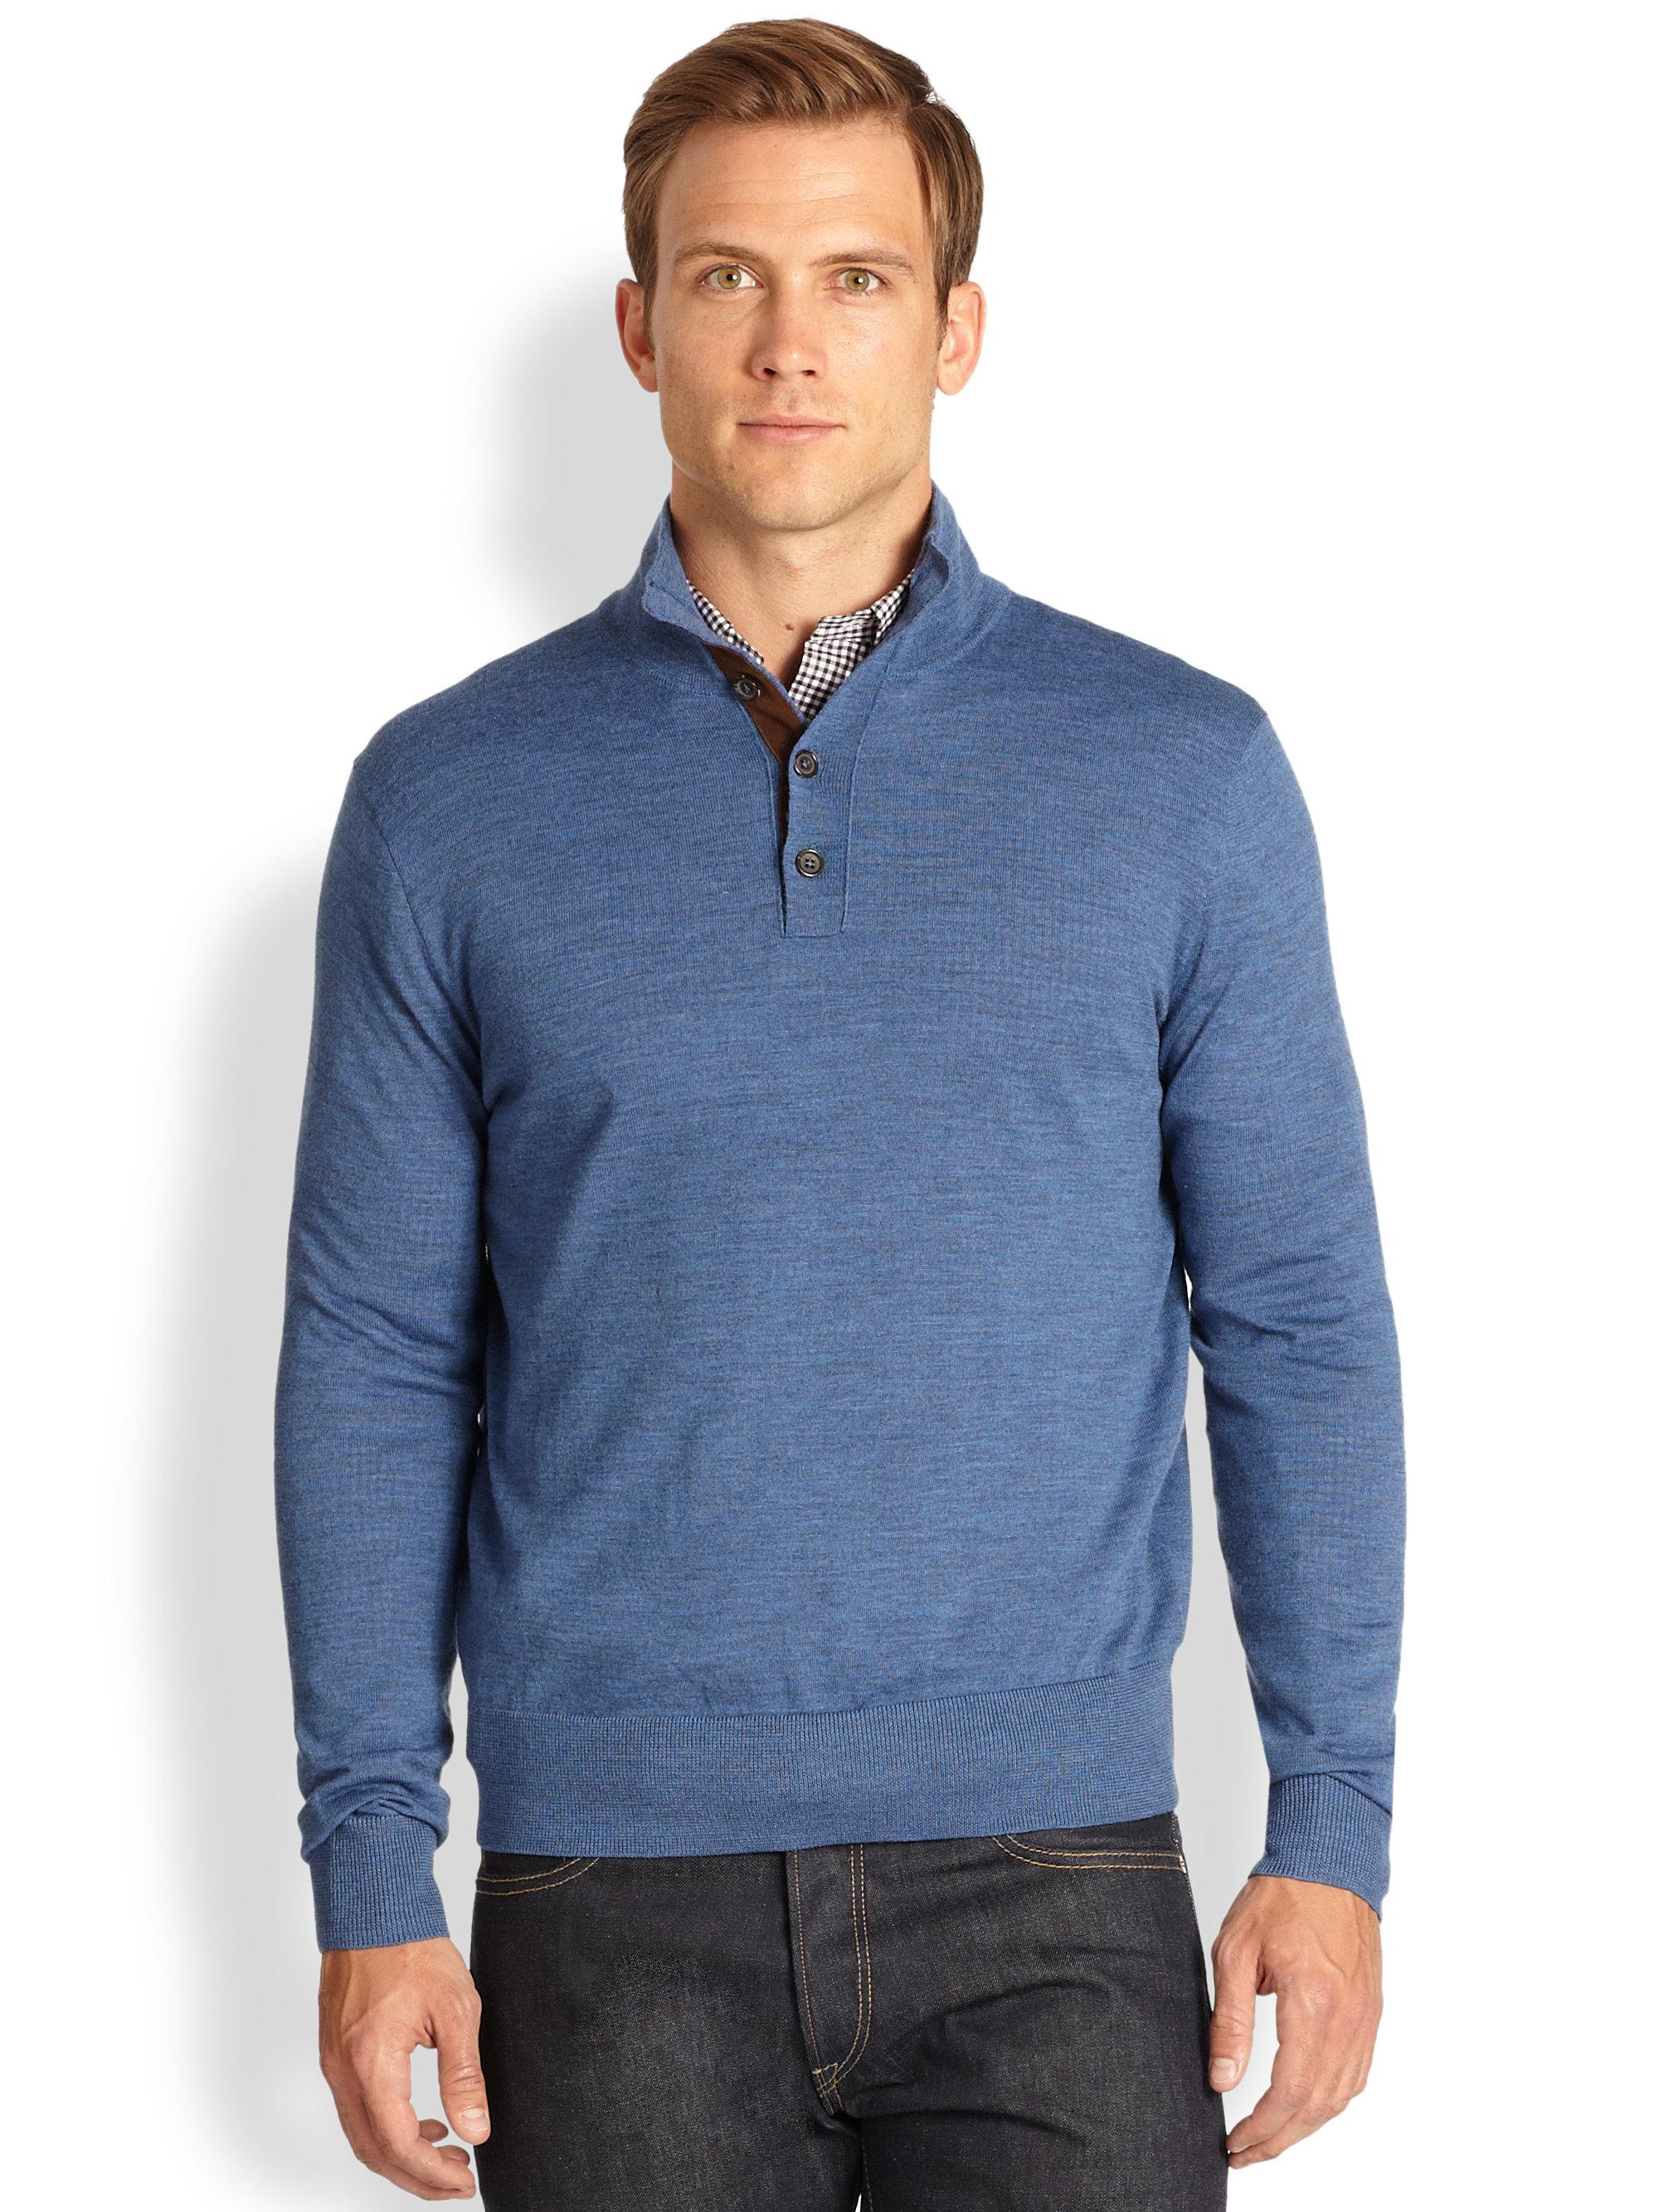 Ralph Lauren Dark Men Big Orange Blue Pony Polo | Euro Star Limos. polo ralph lauren 3-button mock-turtleneck sweater .